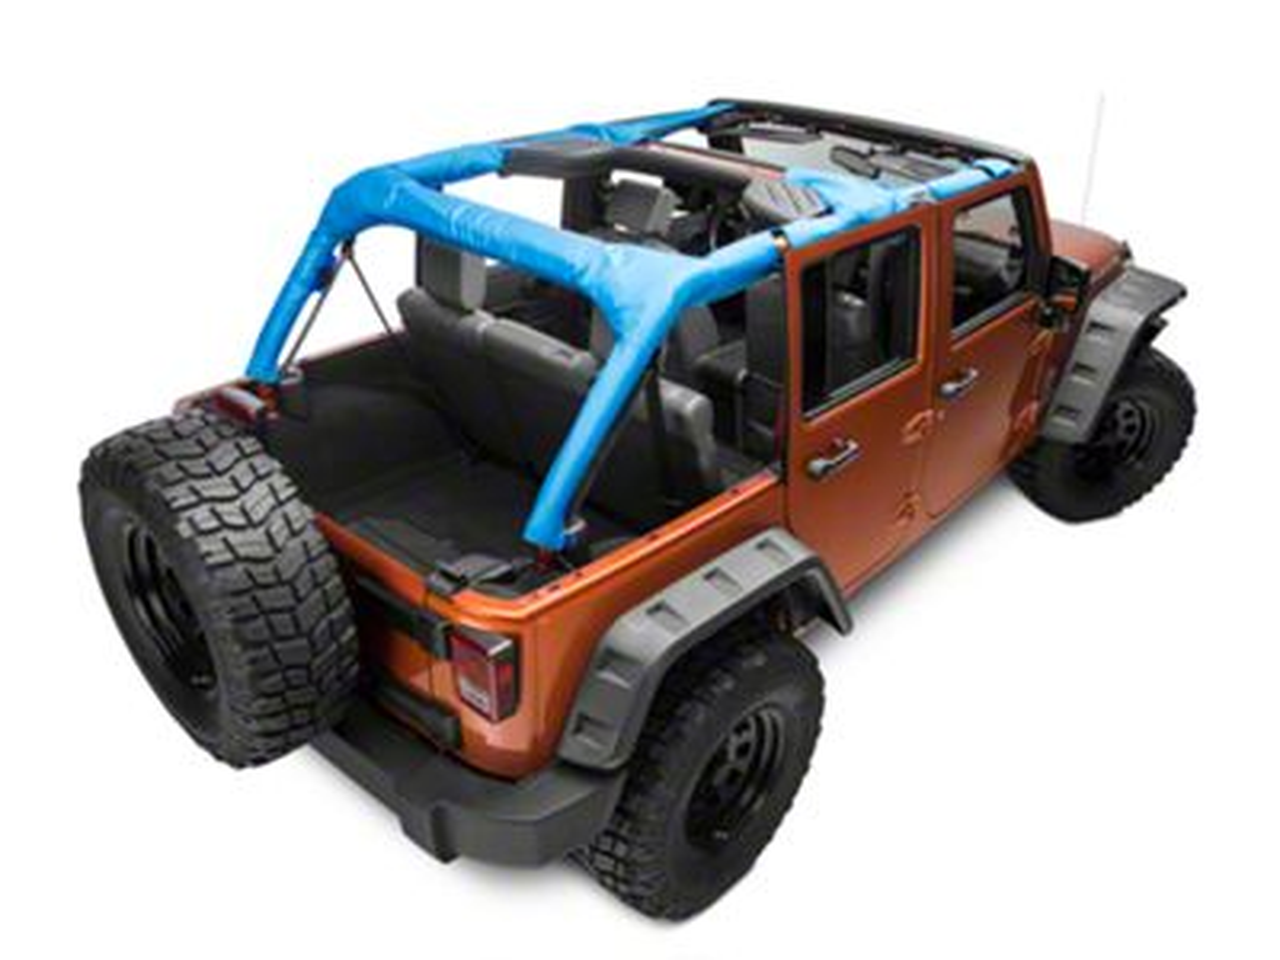 Dirty Dog 4x4 Roll Bar Covers - Blue (07-18 Jeep Wrangler JK 4 Door)